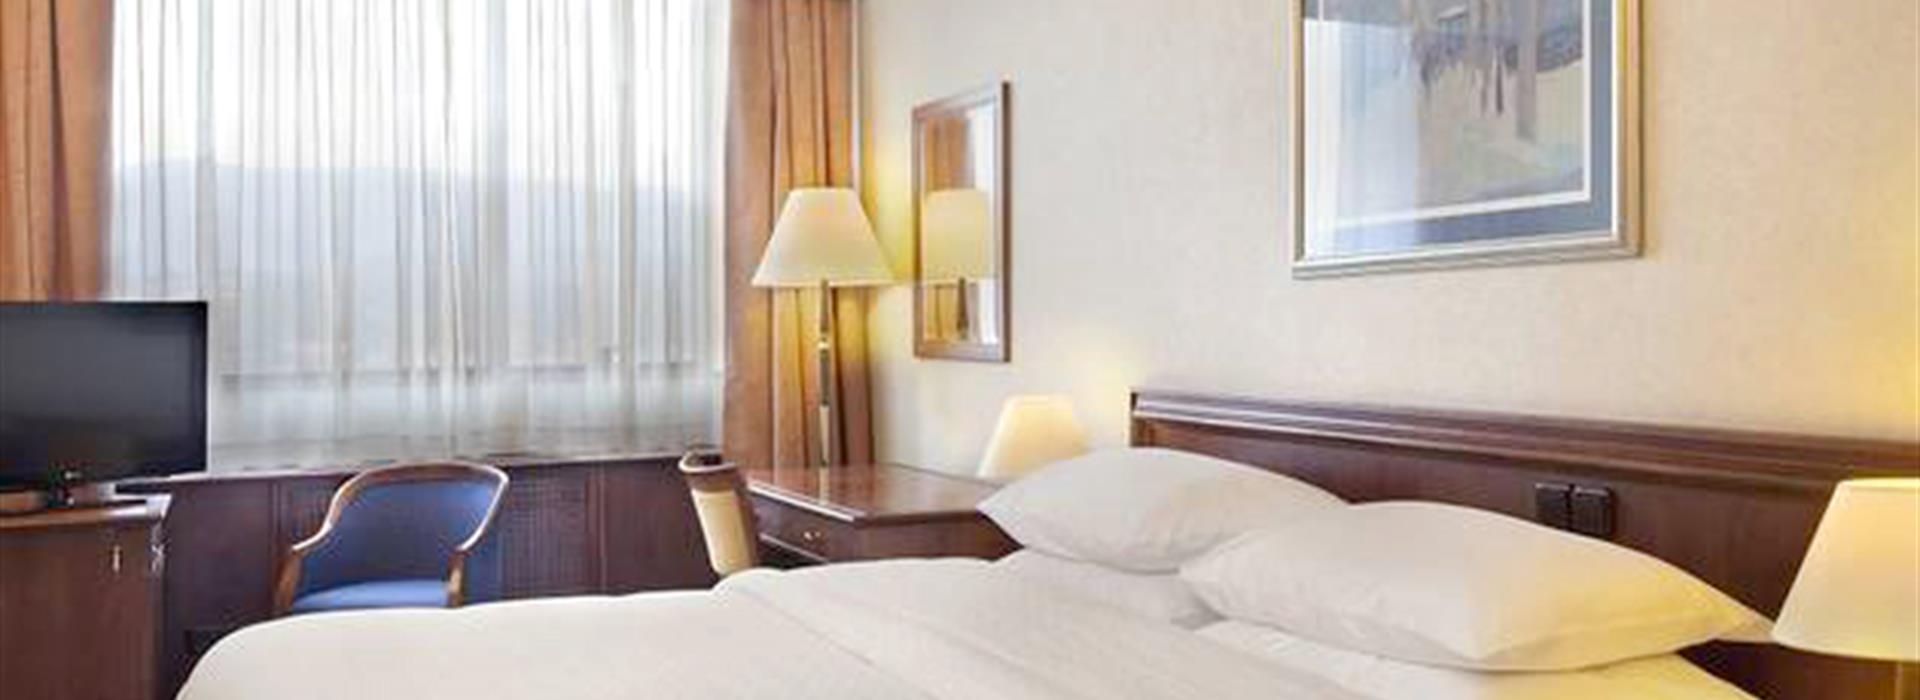 ozo-hotel-amsterntam